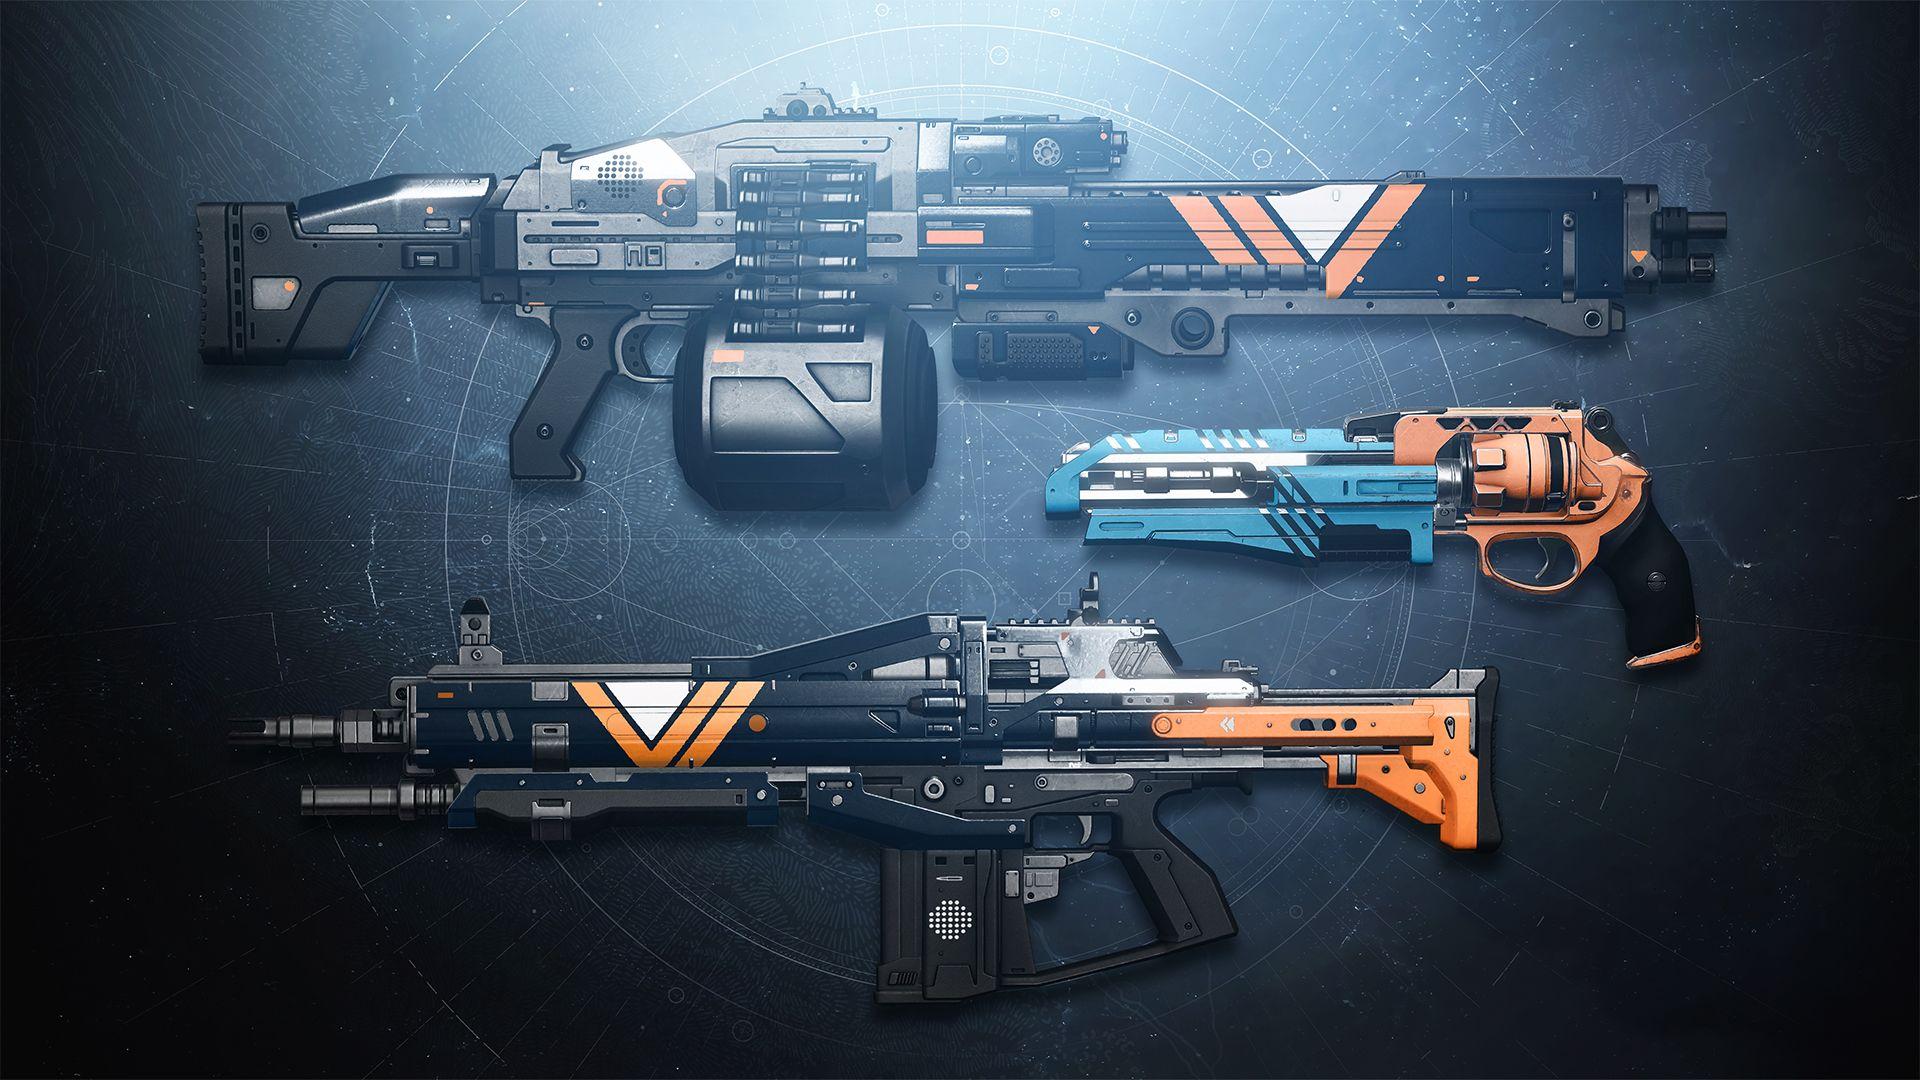 Destiny 2 - Nightfall Weapons